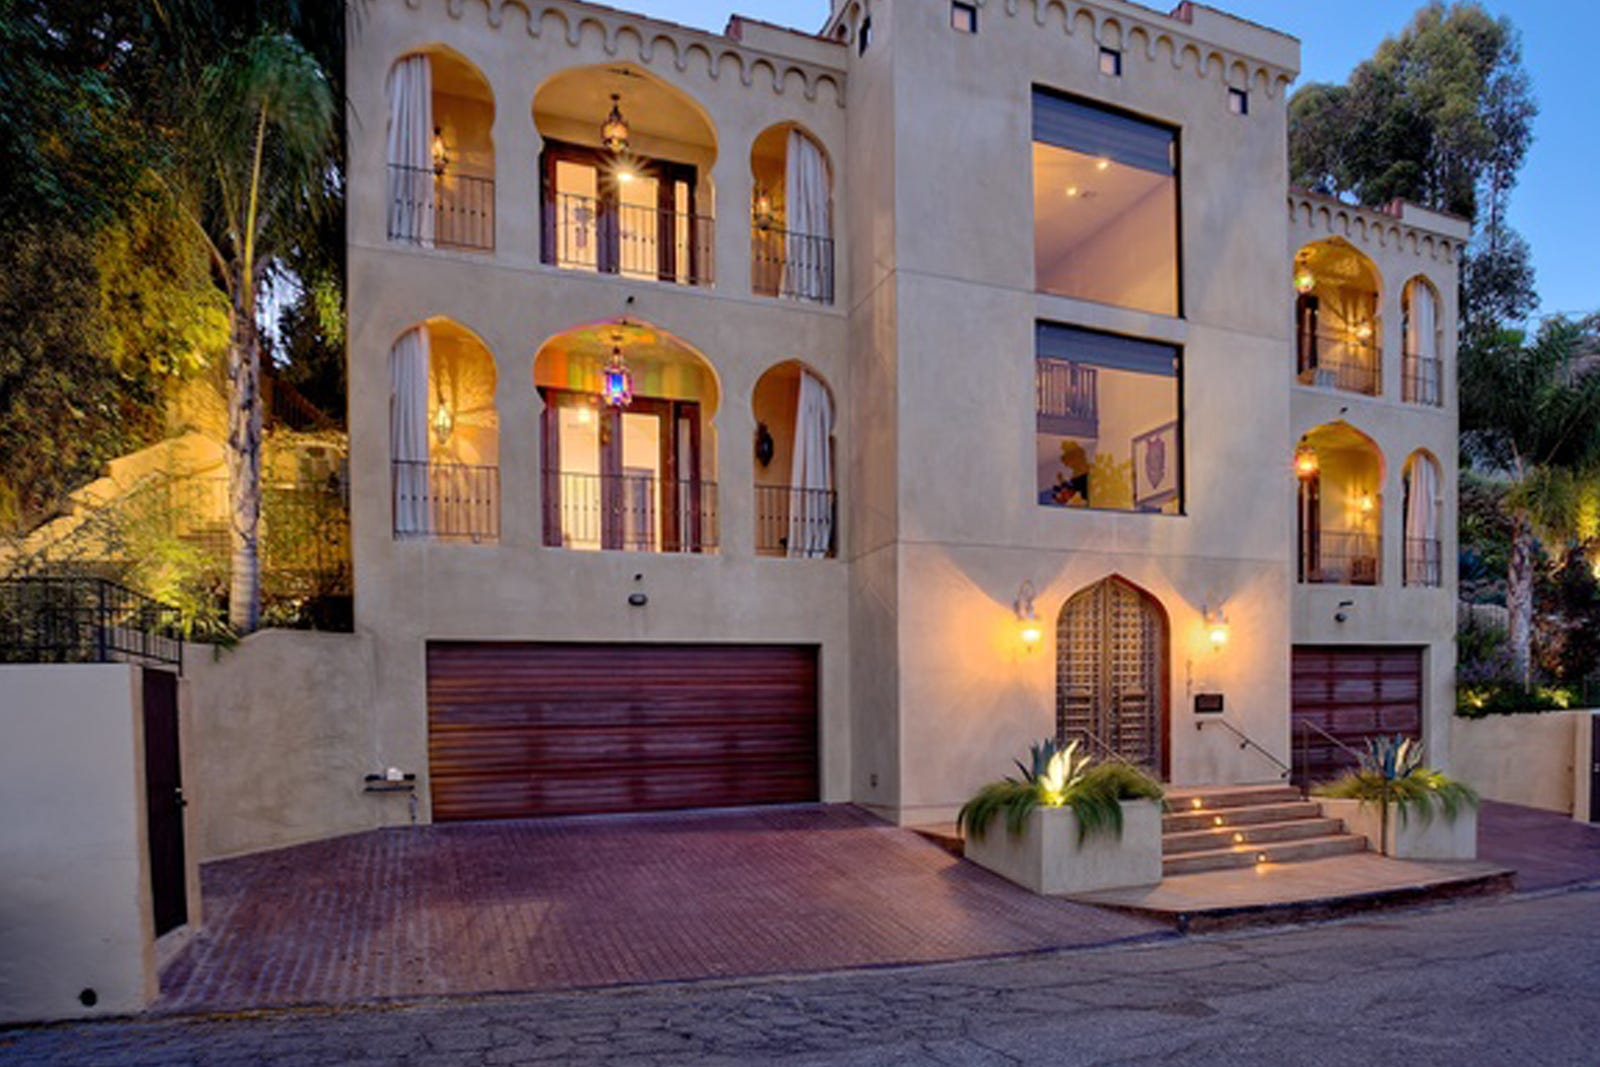 Taraji p henson hollywood hills mansion empire for Hollywood mansion for sale